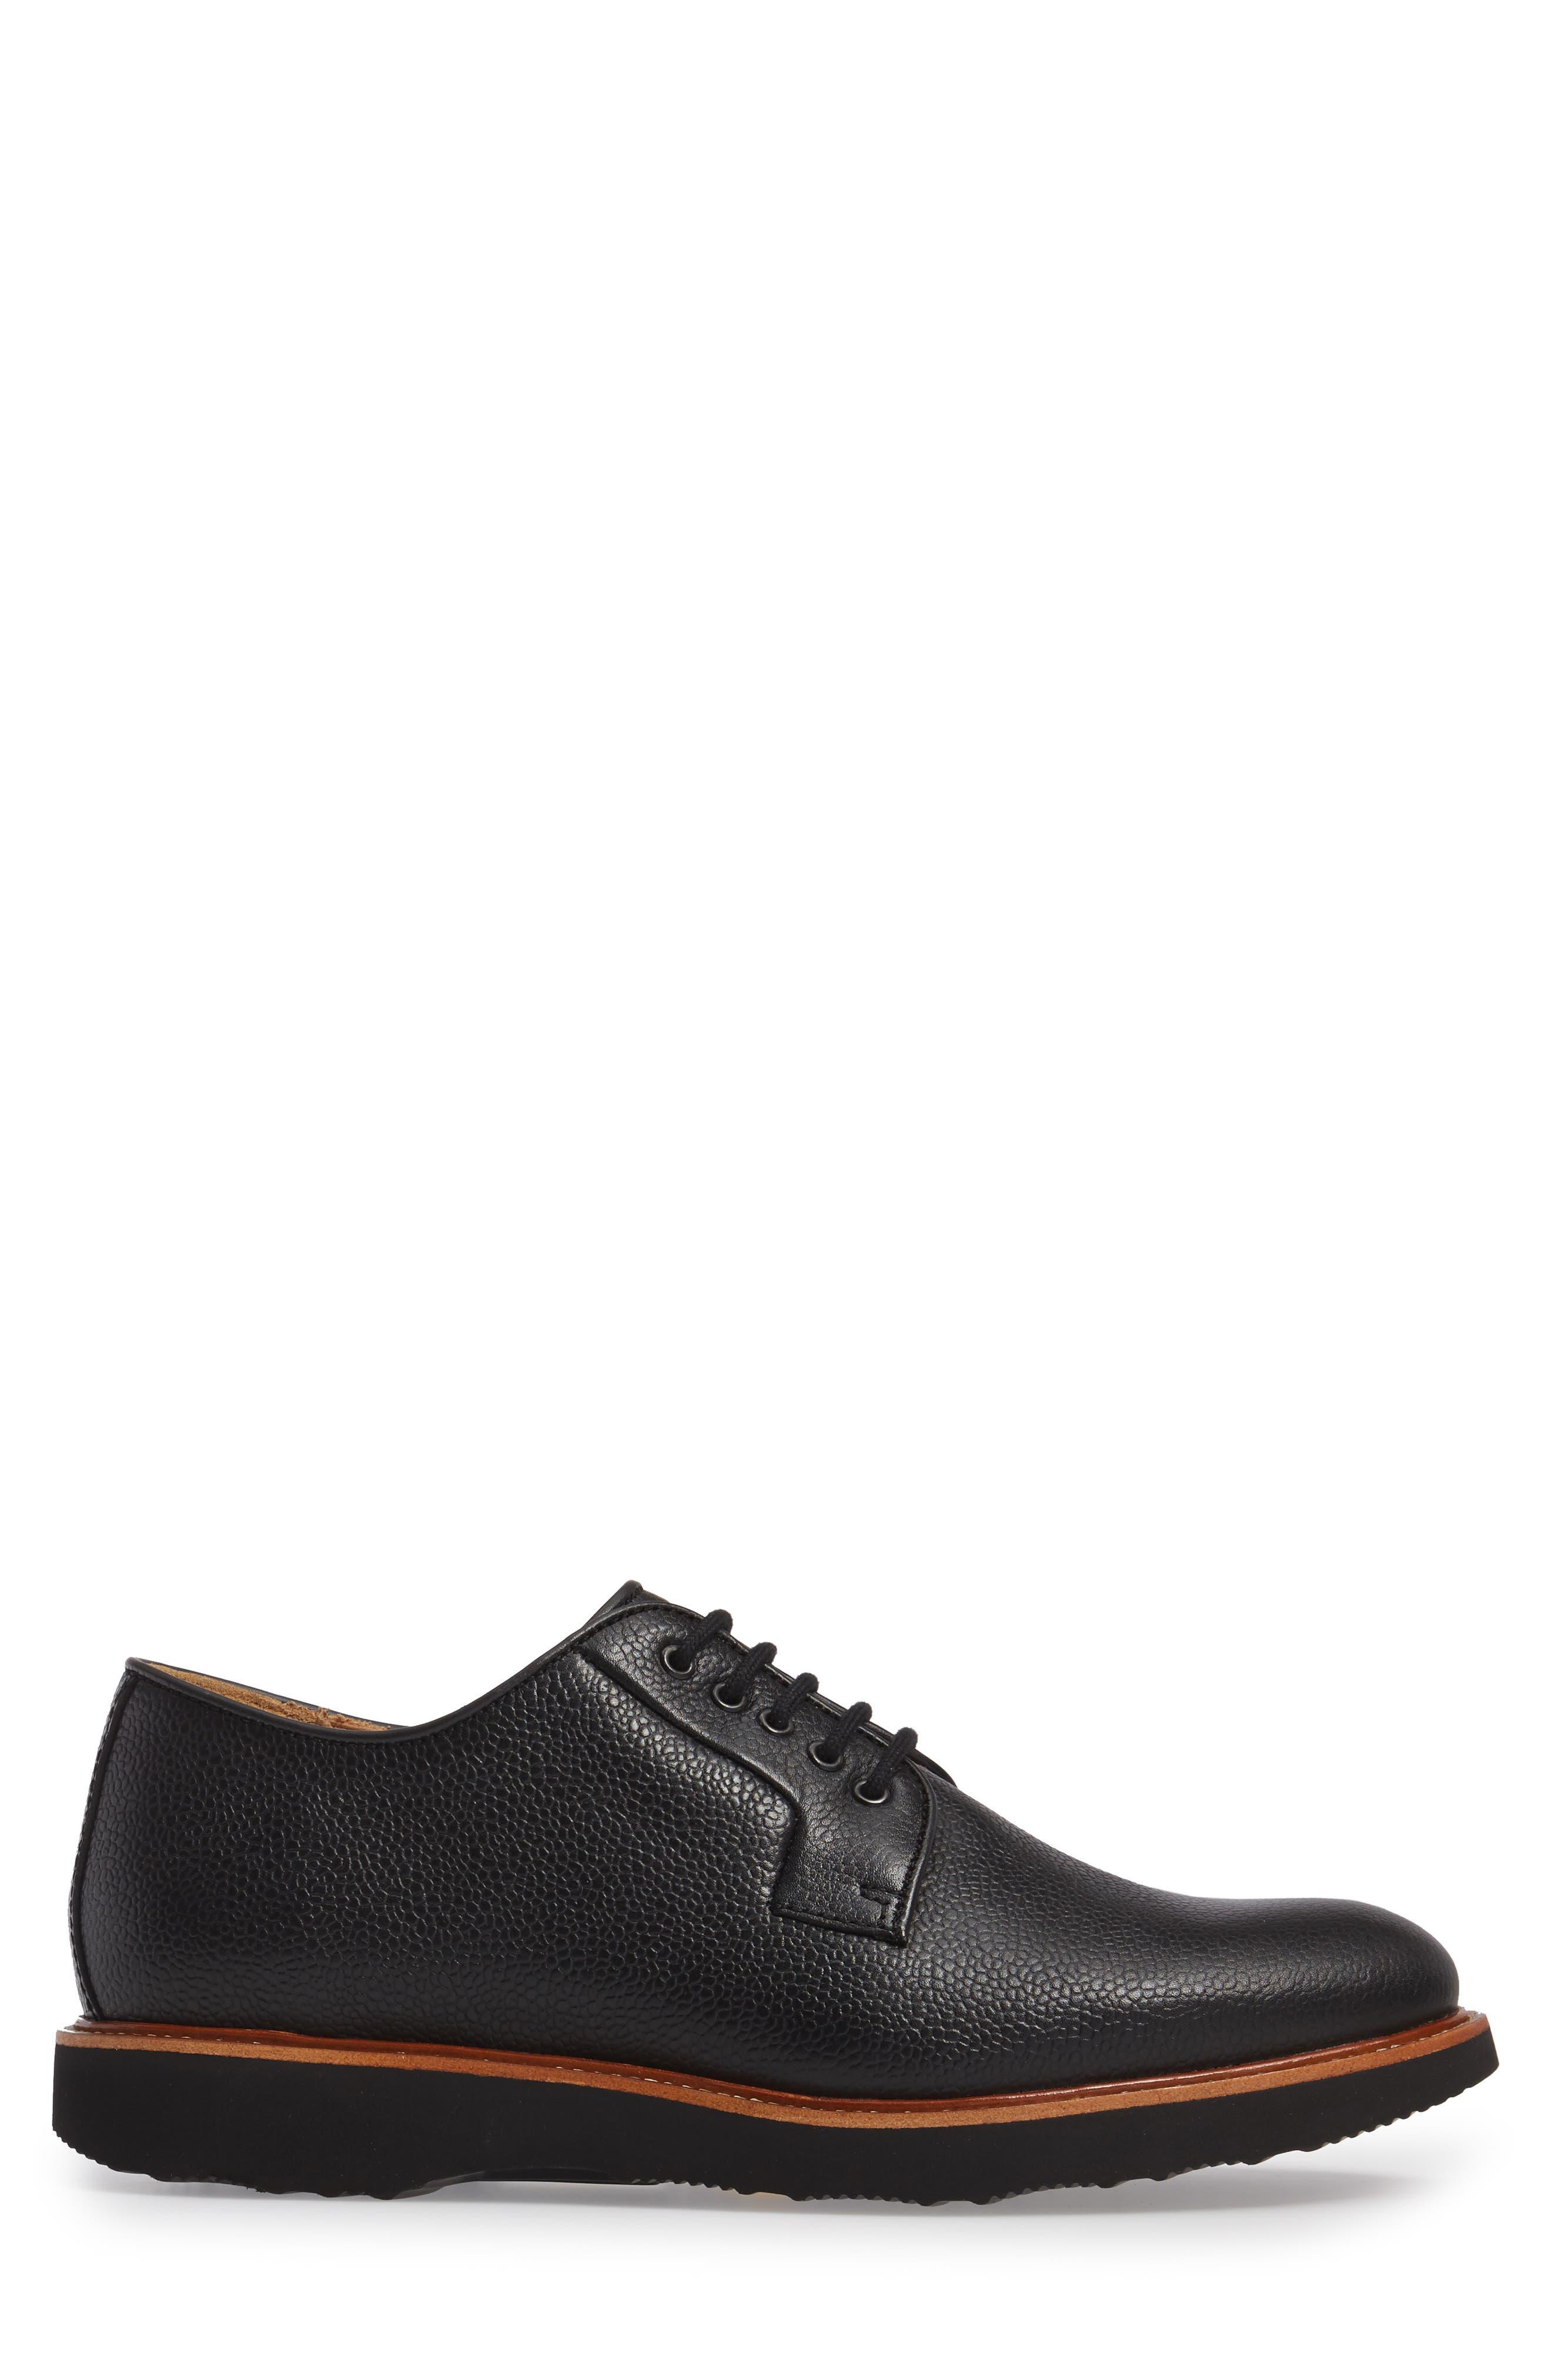 SAMUEL HUBBARD, Highlander Plain Toe Derby, Alternate thumbnail 3, color, BLACK PEBBLE GRAIN